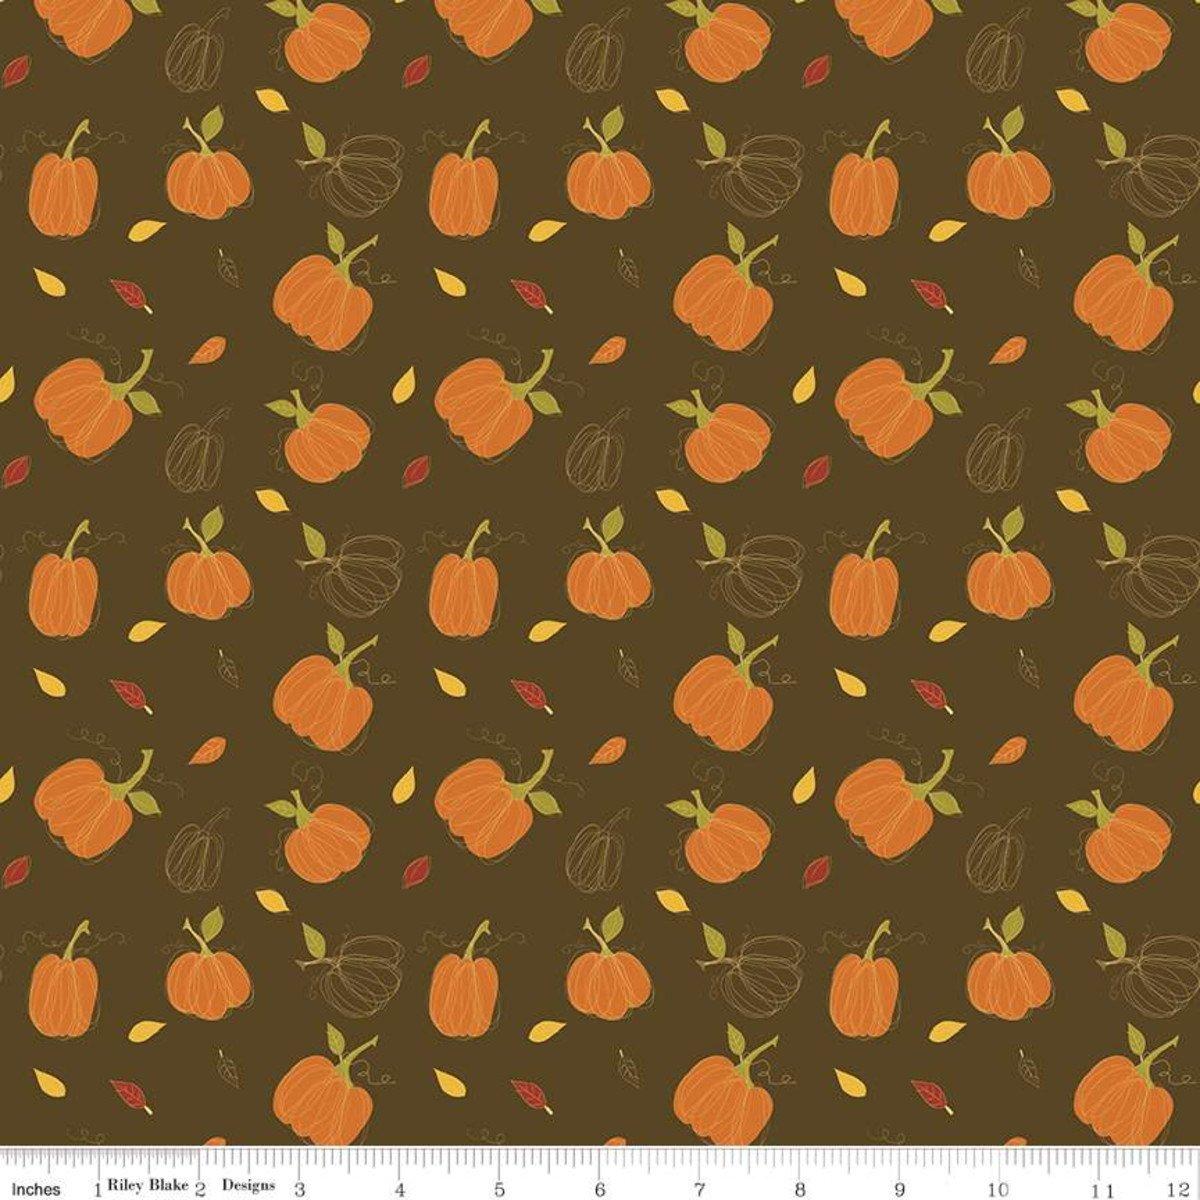 Riley Blake, Adel in Autumn - Pumpkins Chocolate